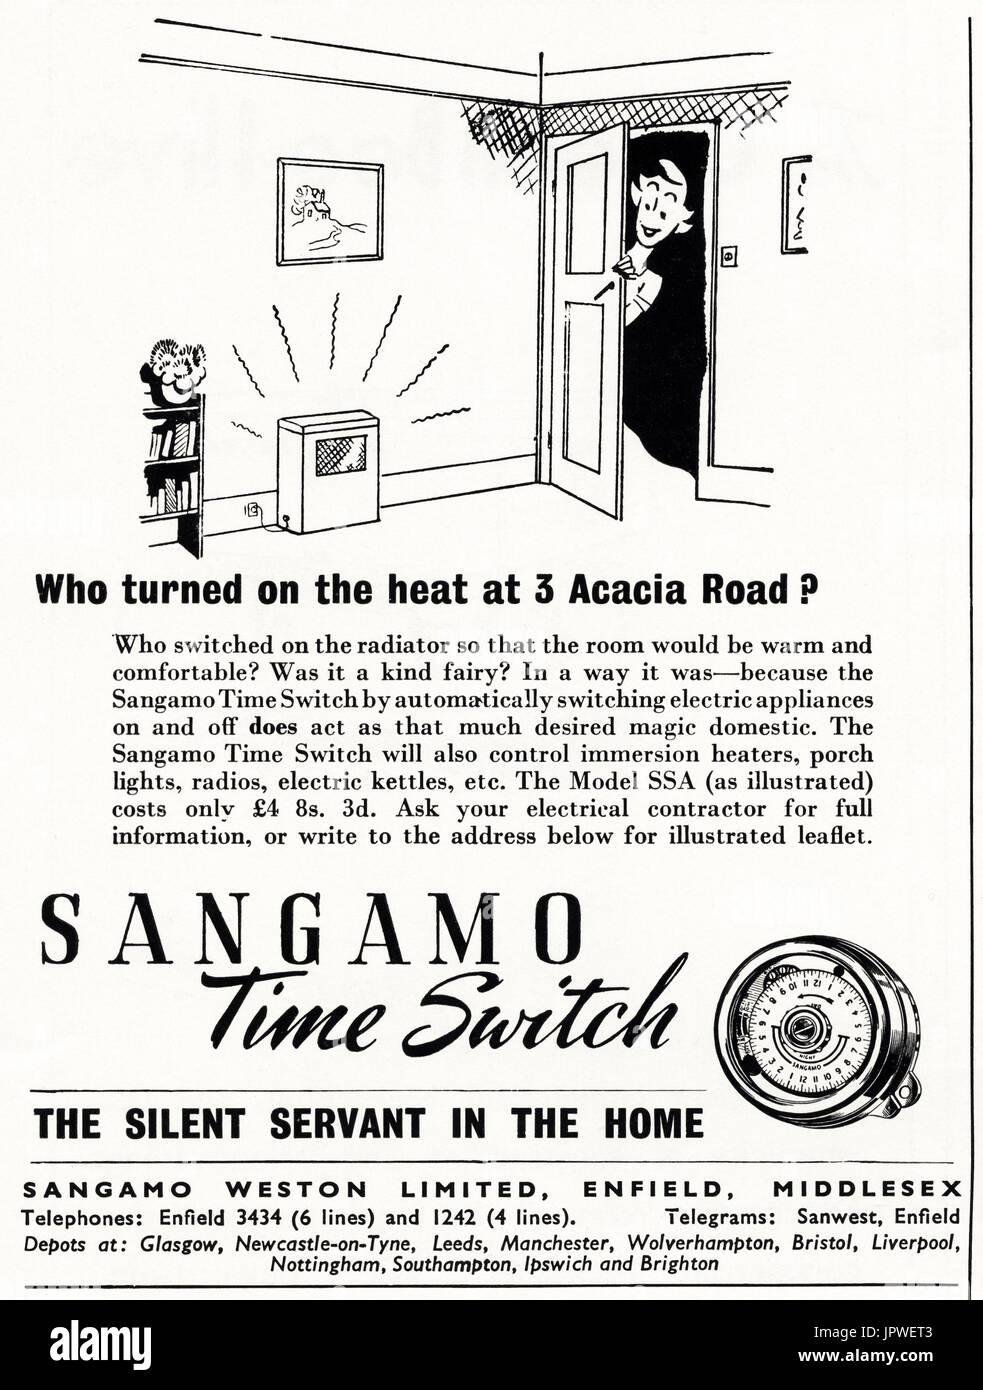 1950s old vintage original retro advert advertising Sangamo time switch for household electric appliances in magazine circa 1950 - Stock Image